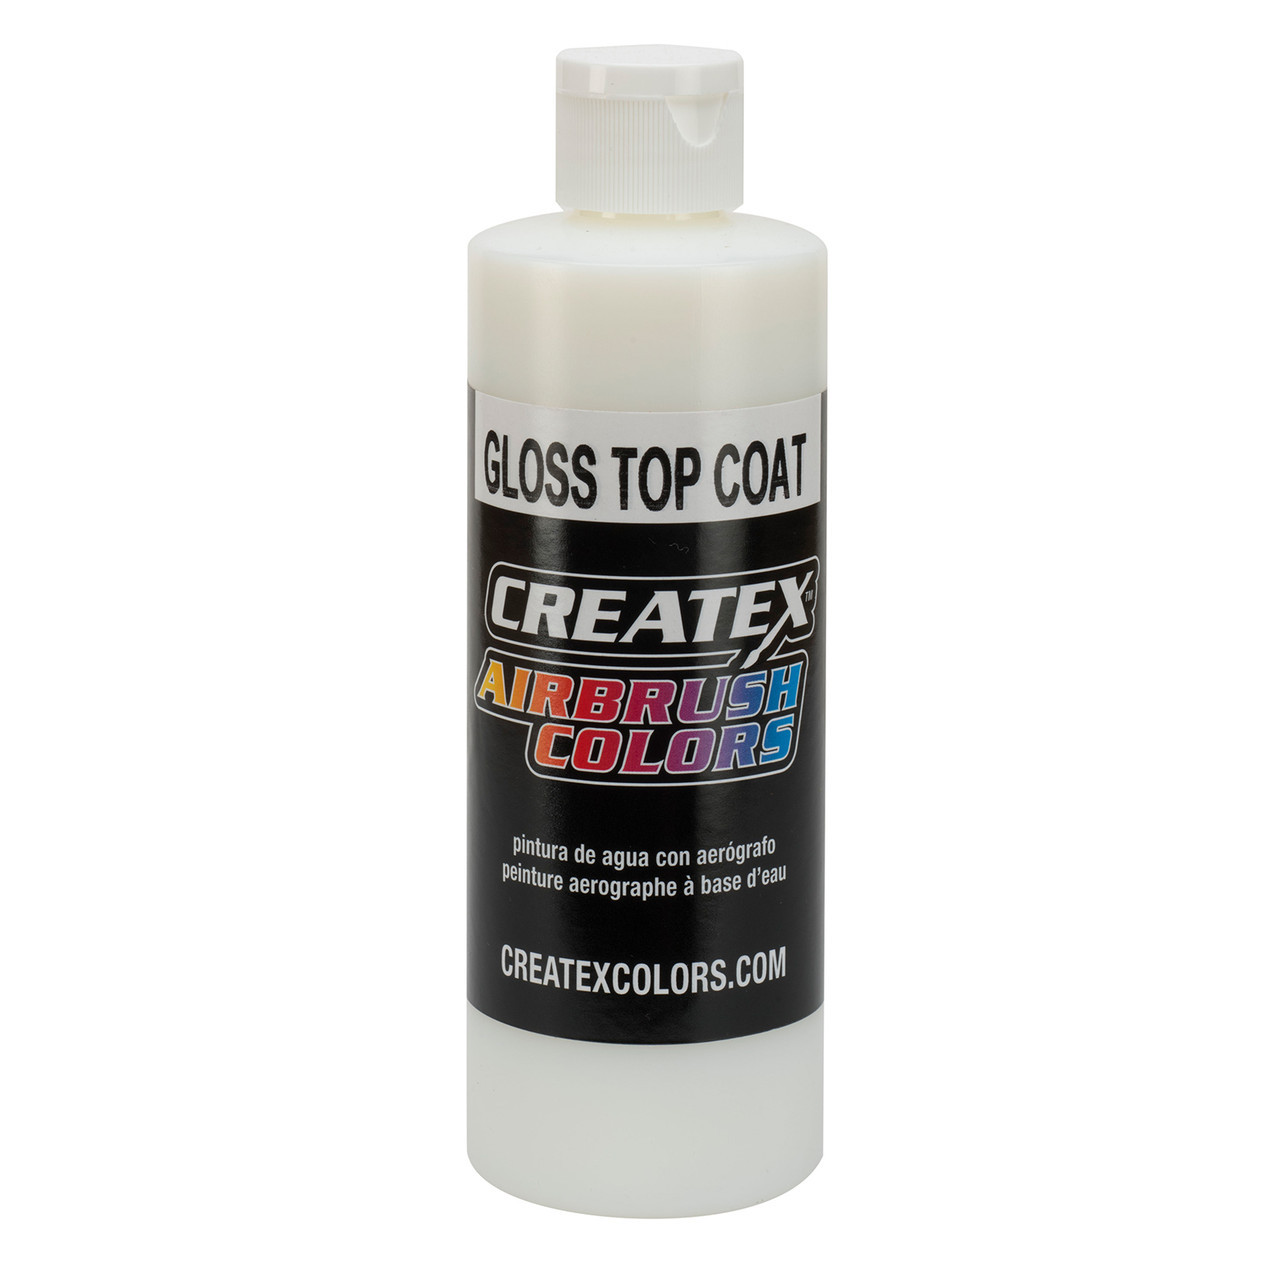 Createx Airbrush Matte Top Coat (глянцевый защитный лак) 120 мл